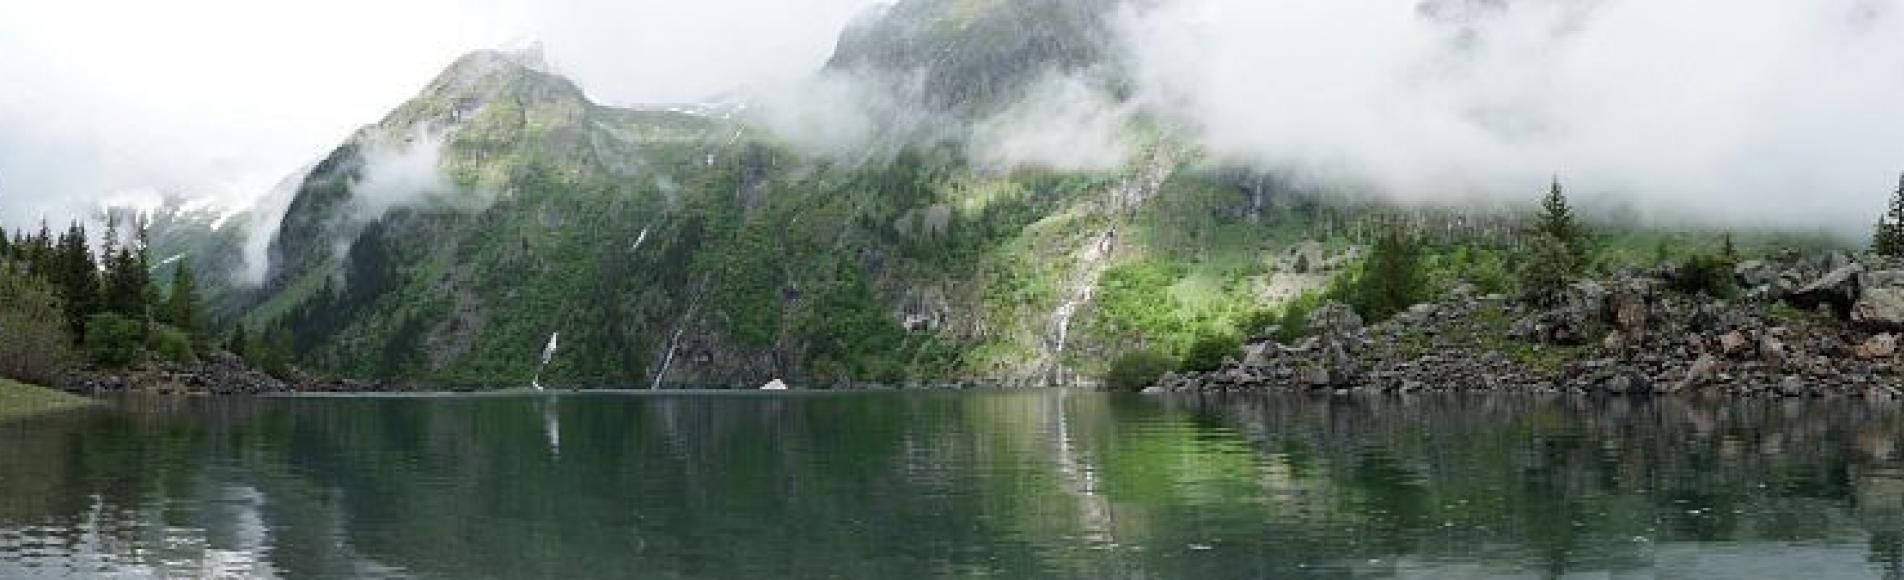 Lac du lauvitel ©ImberdisLudovic